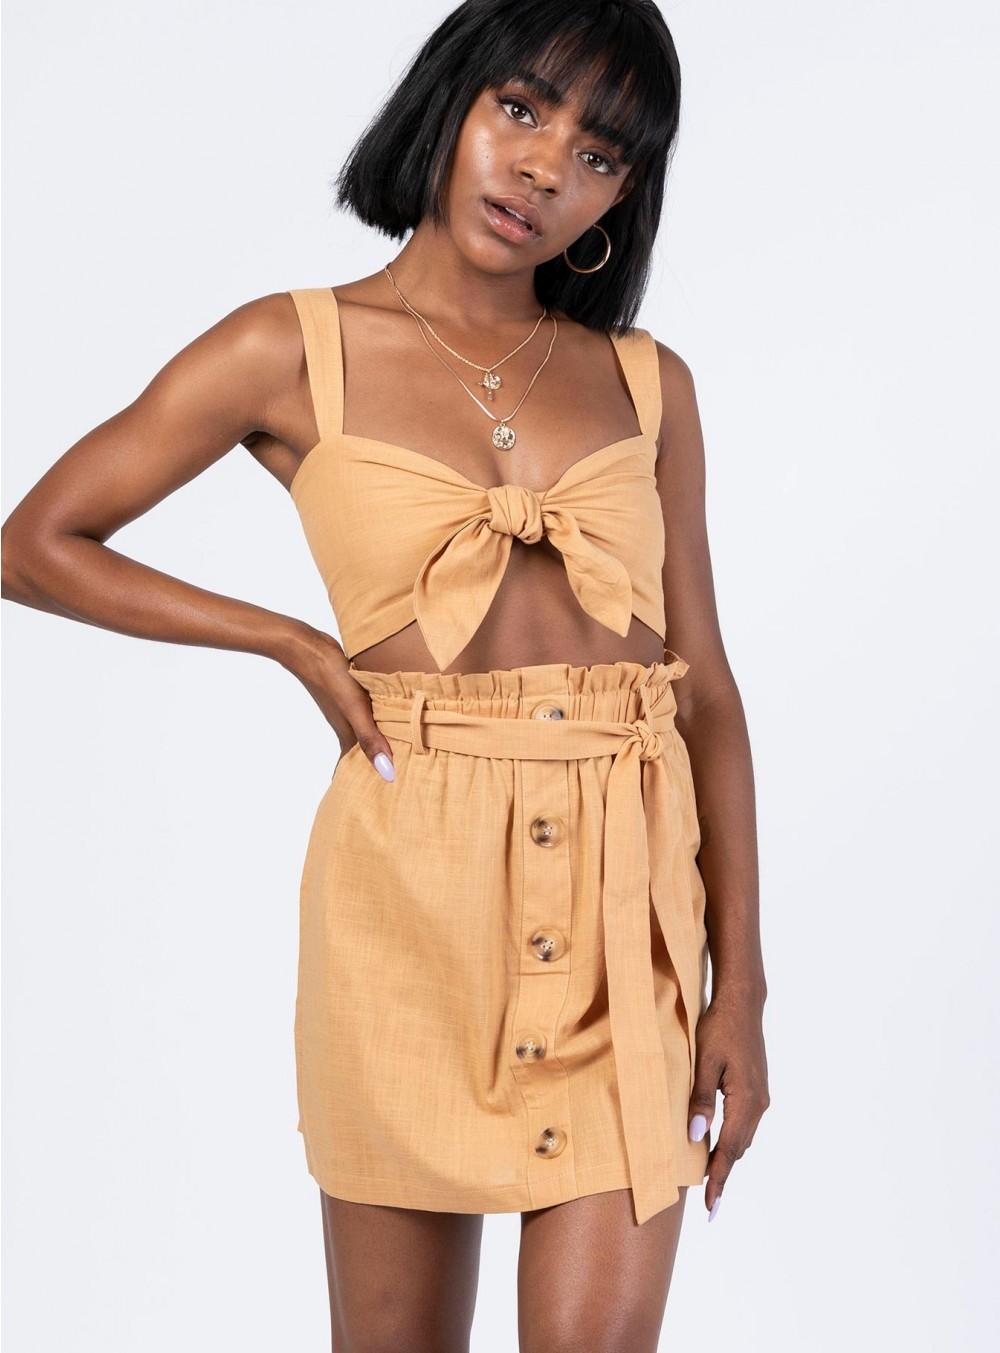 Orange Skirt & Top Set PrincessPolly